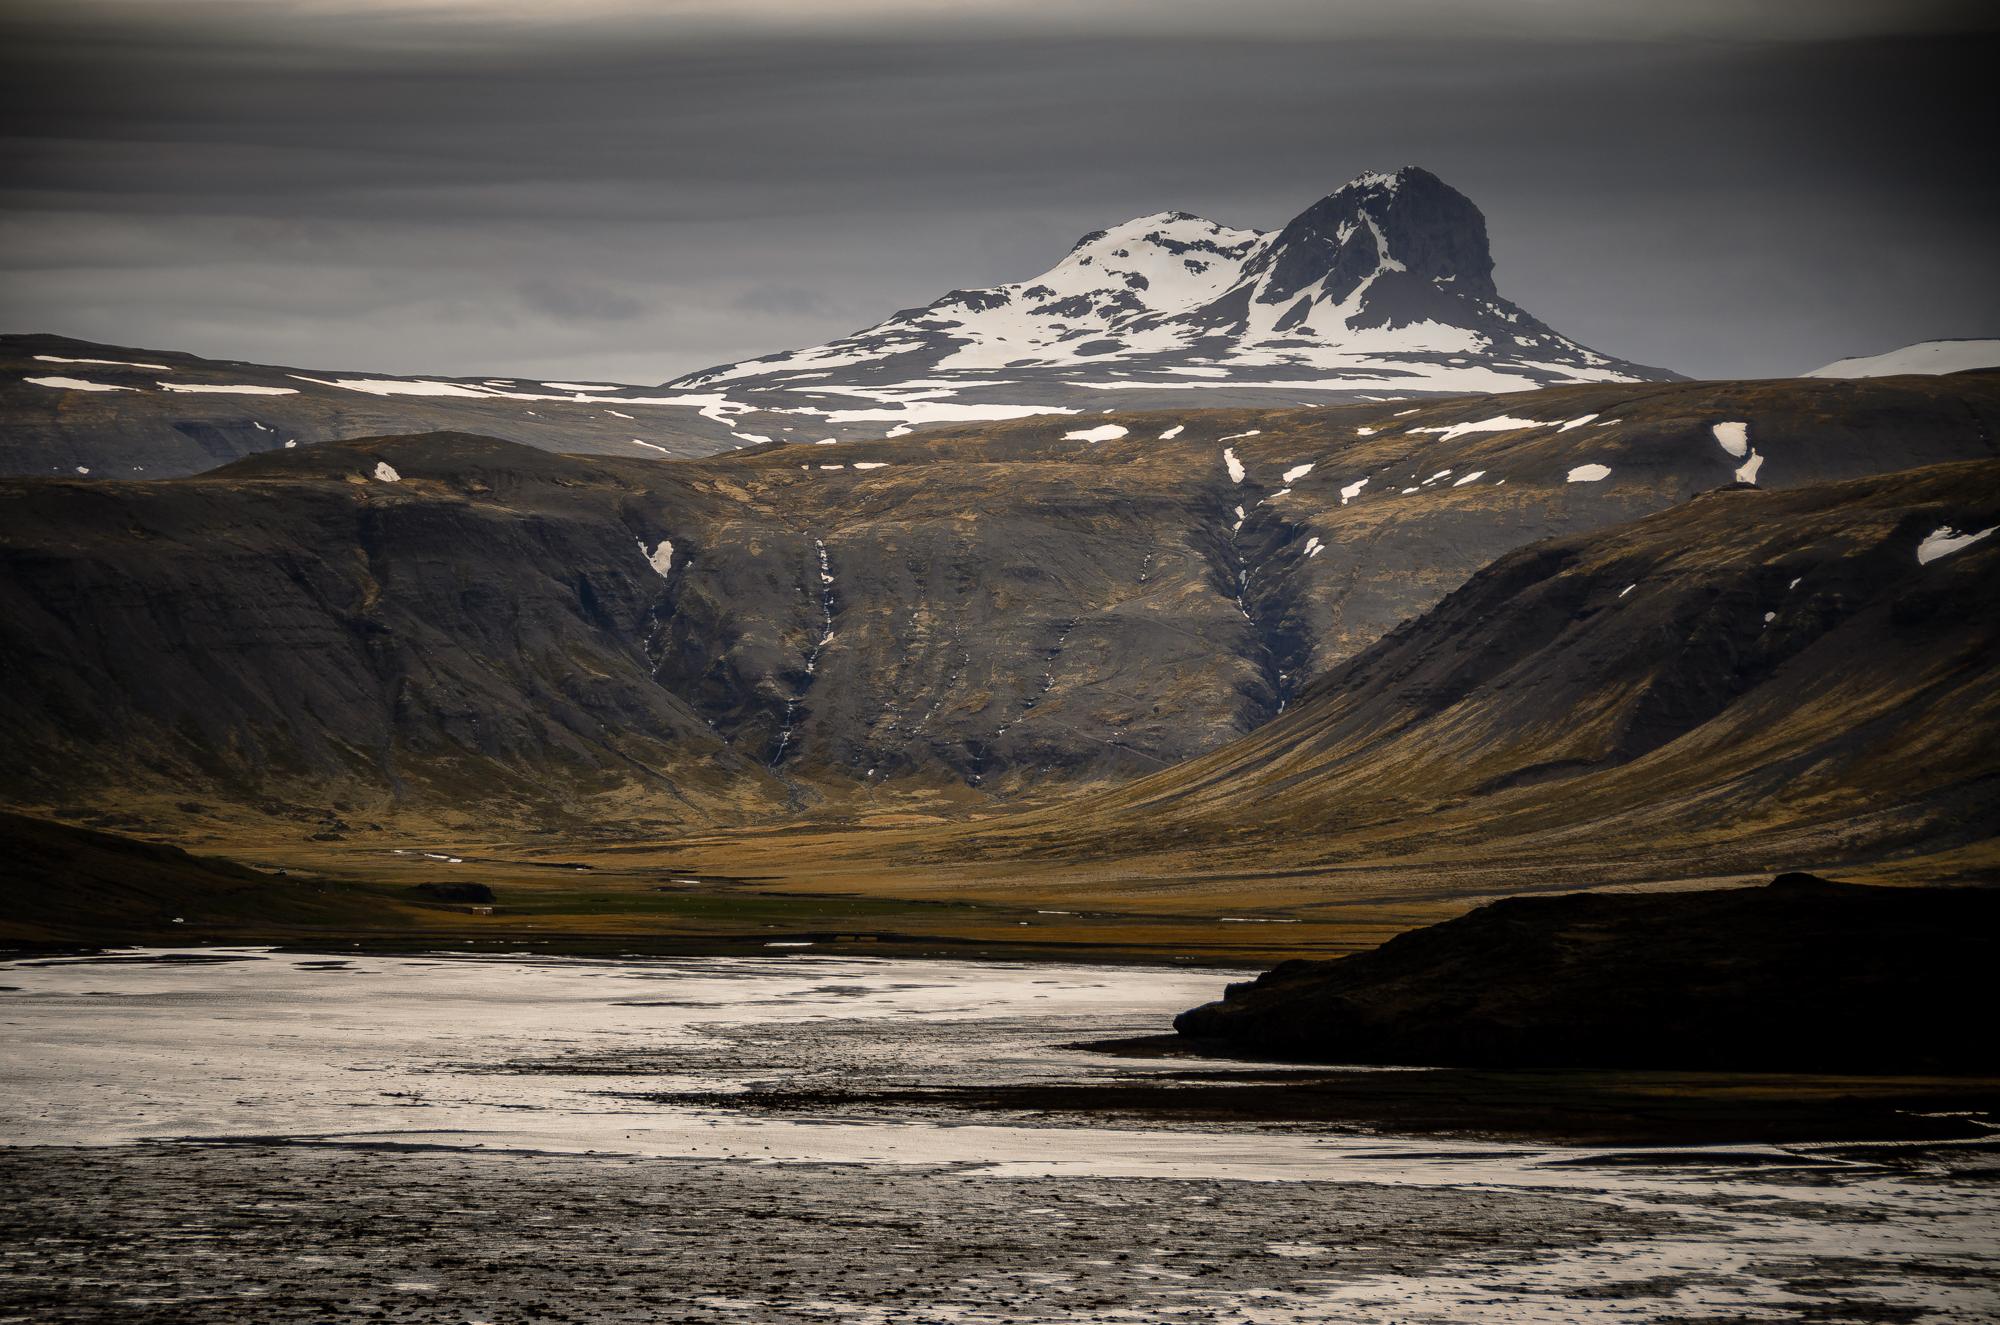 Snowcapped mountain peaks on Snæfellsnes